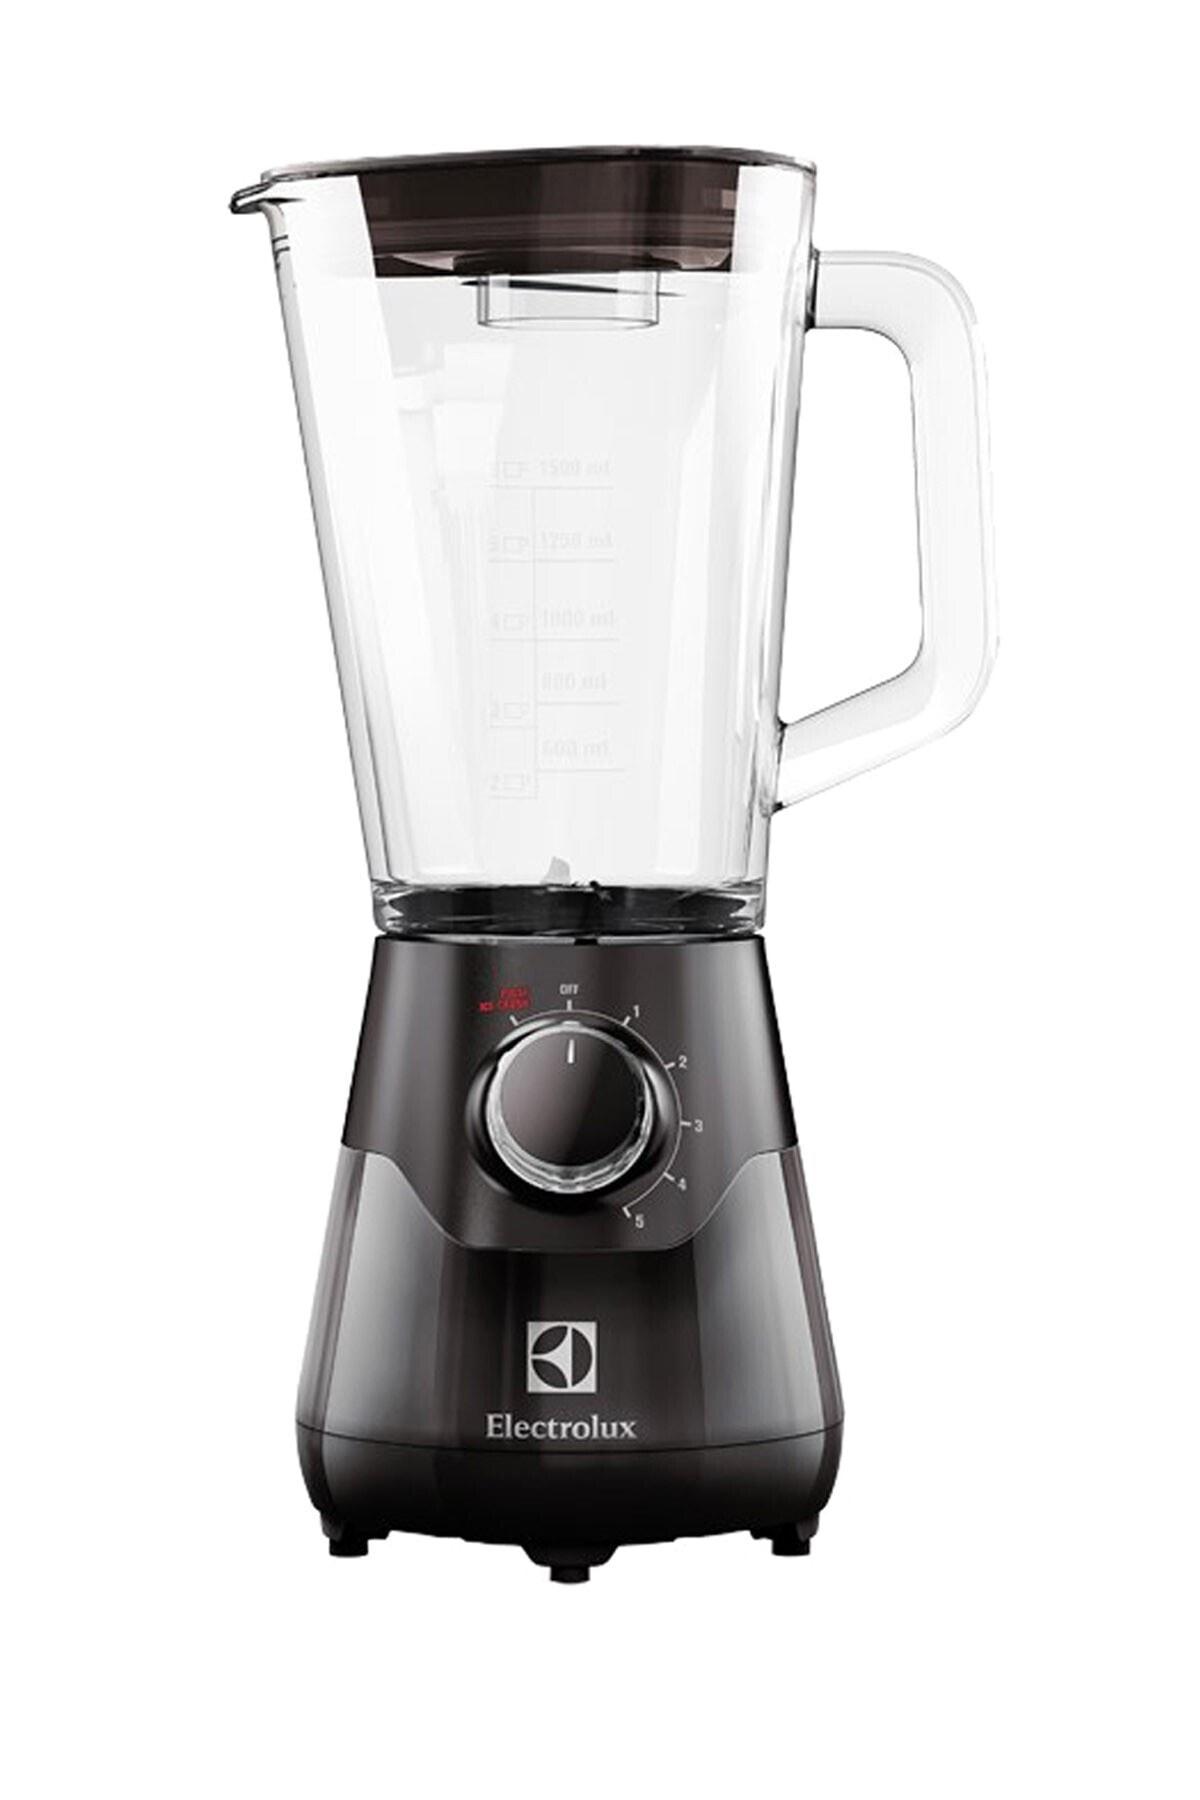 Electrolux Esb5400 Cam Hazneli Sürahi Blender 1